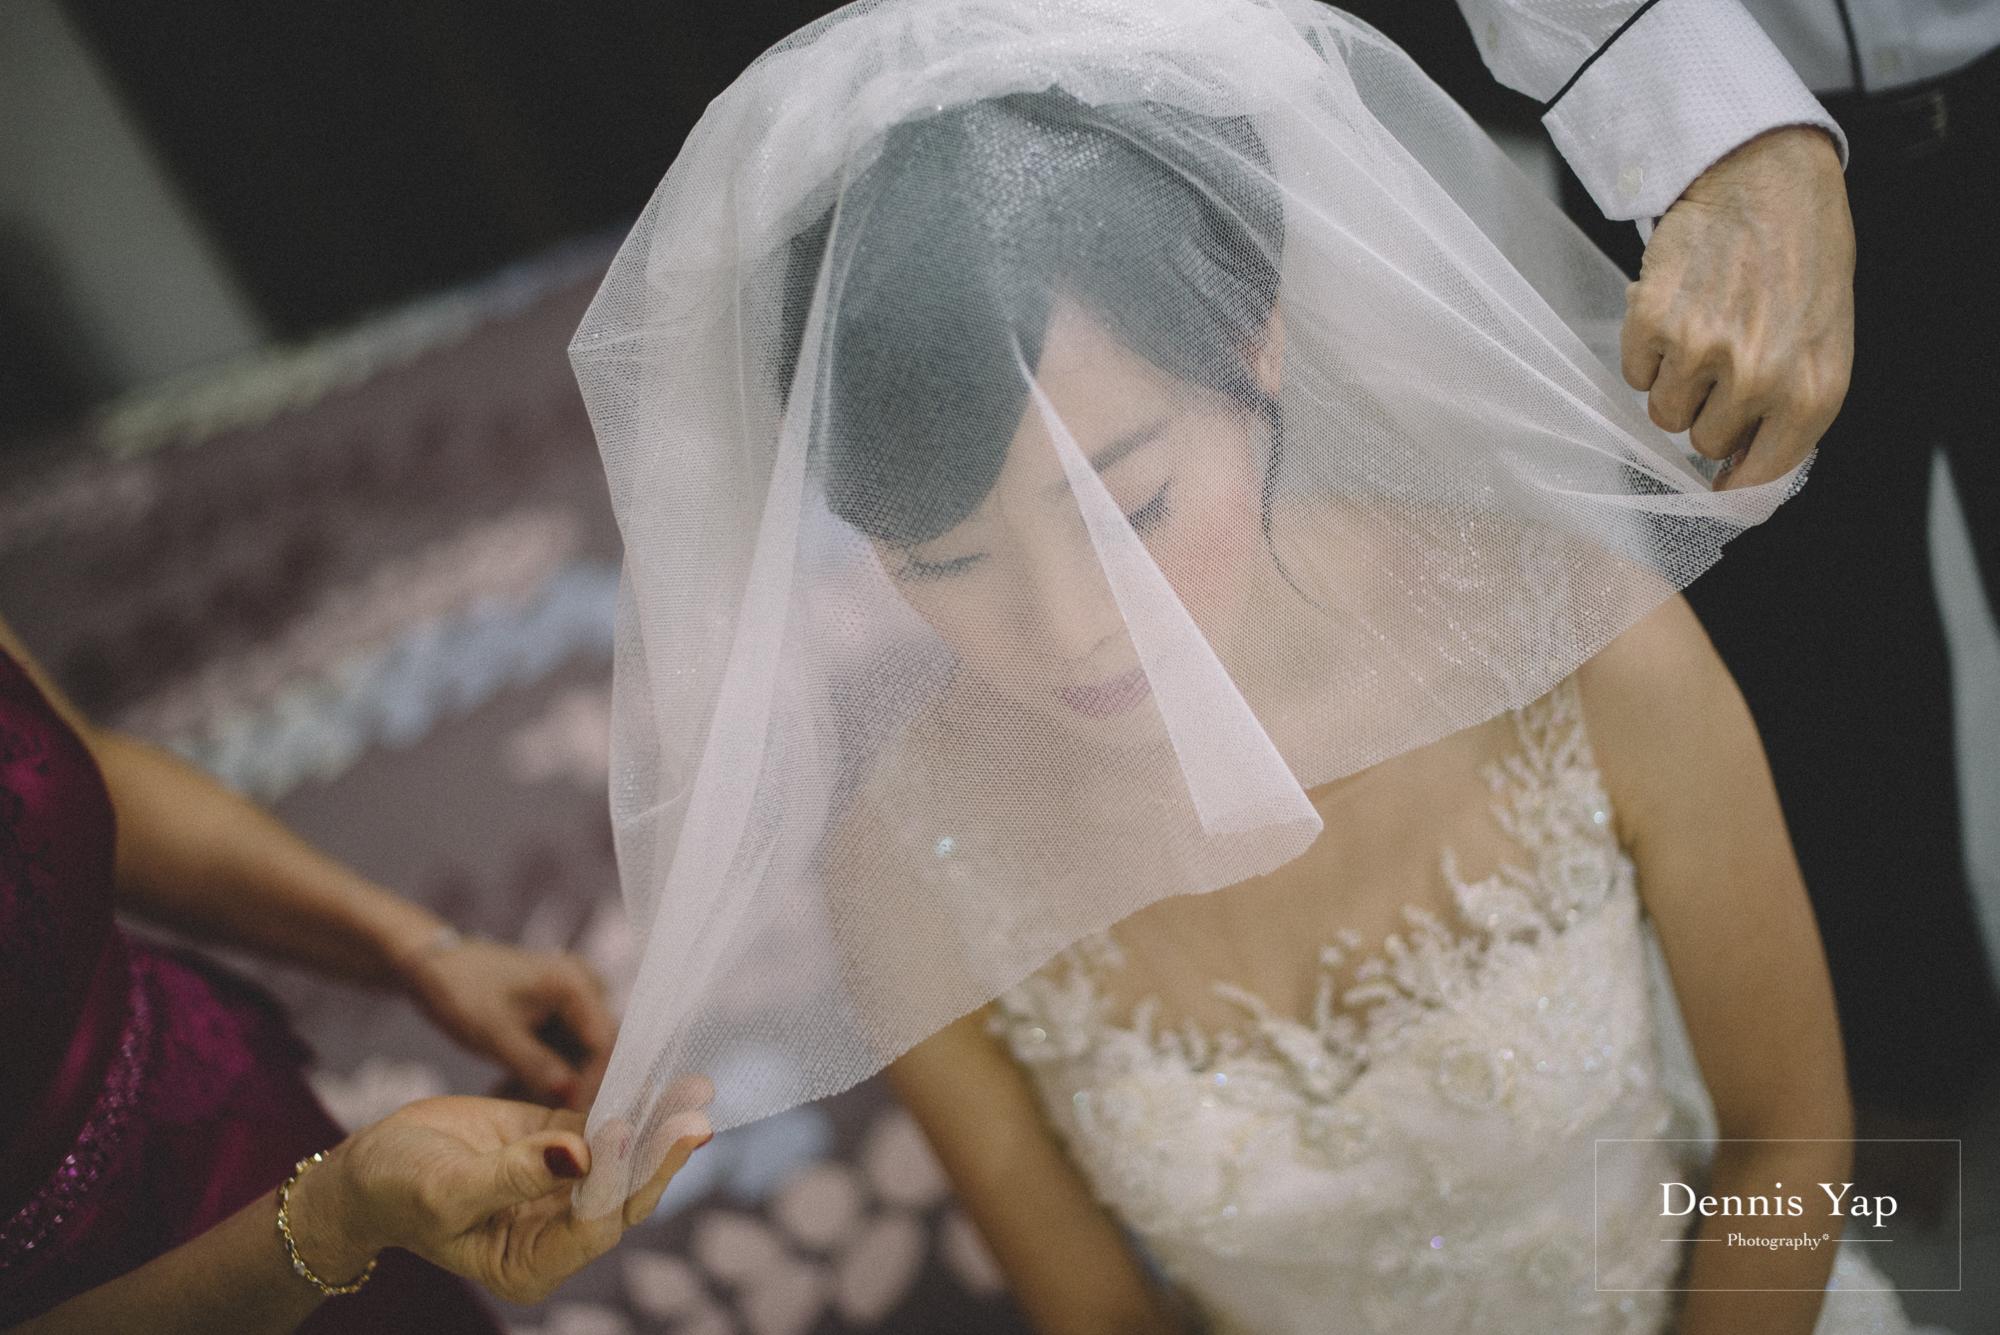 alex shir ley wedding day gate crash subang jaya usj dennis yap photography moments-1.jpg